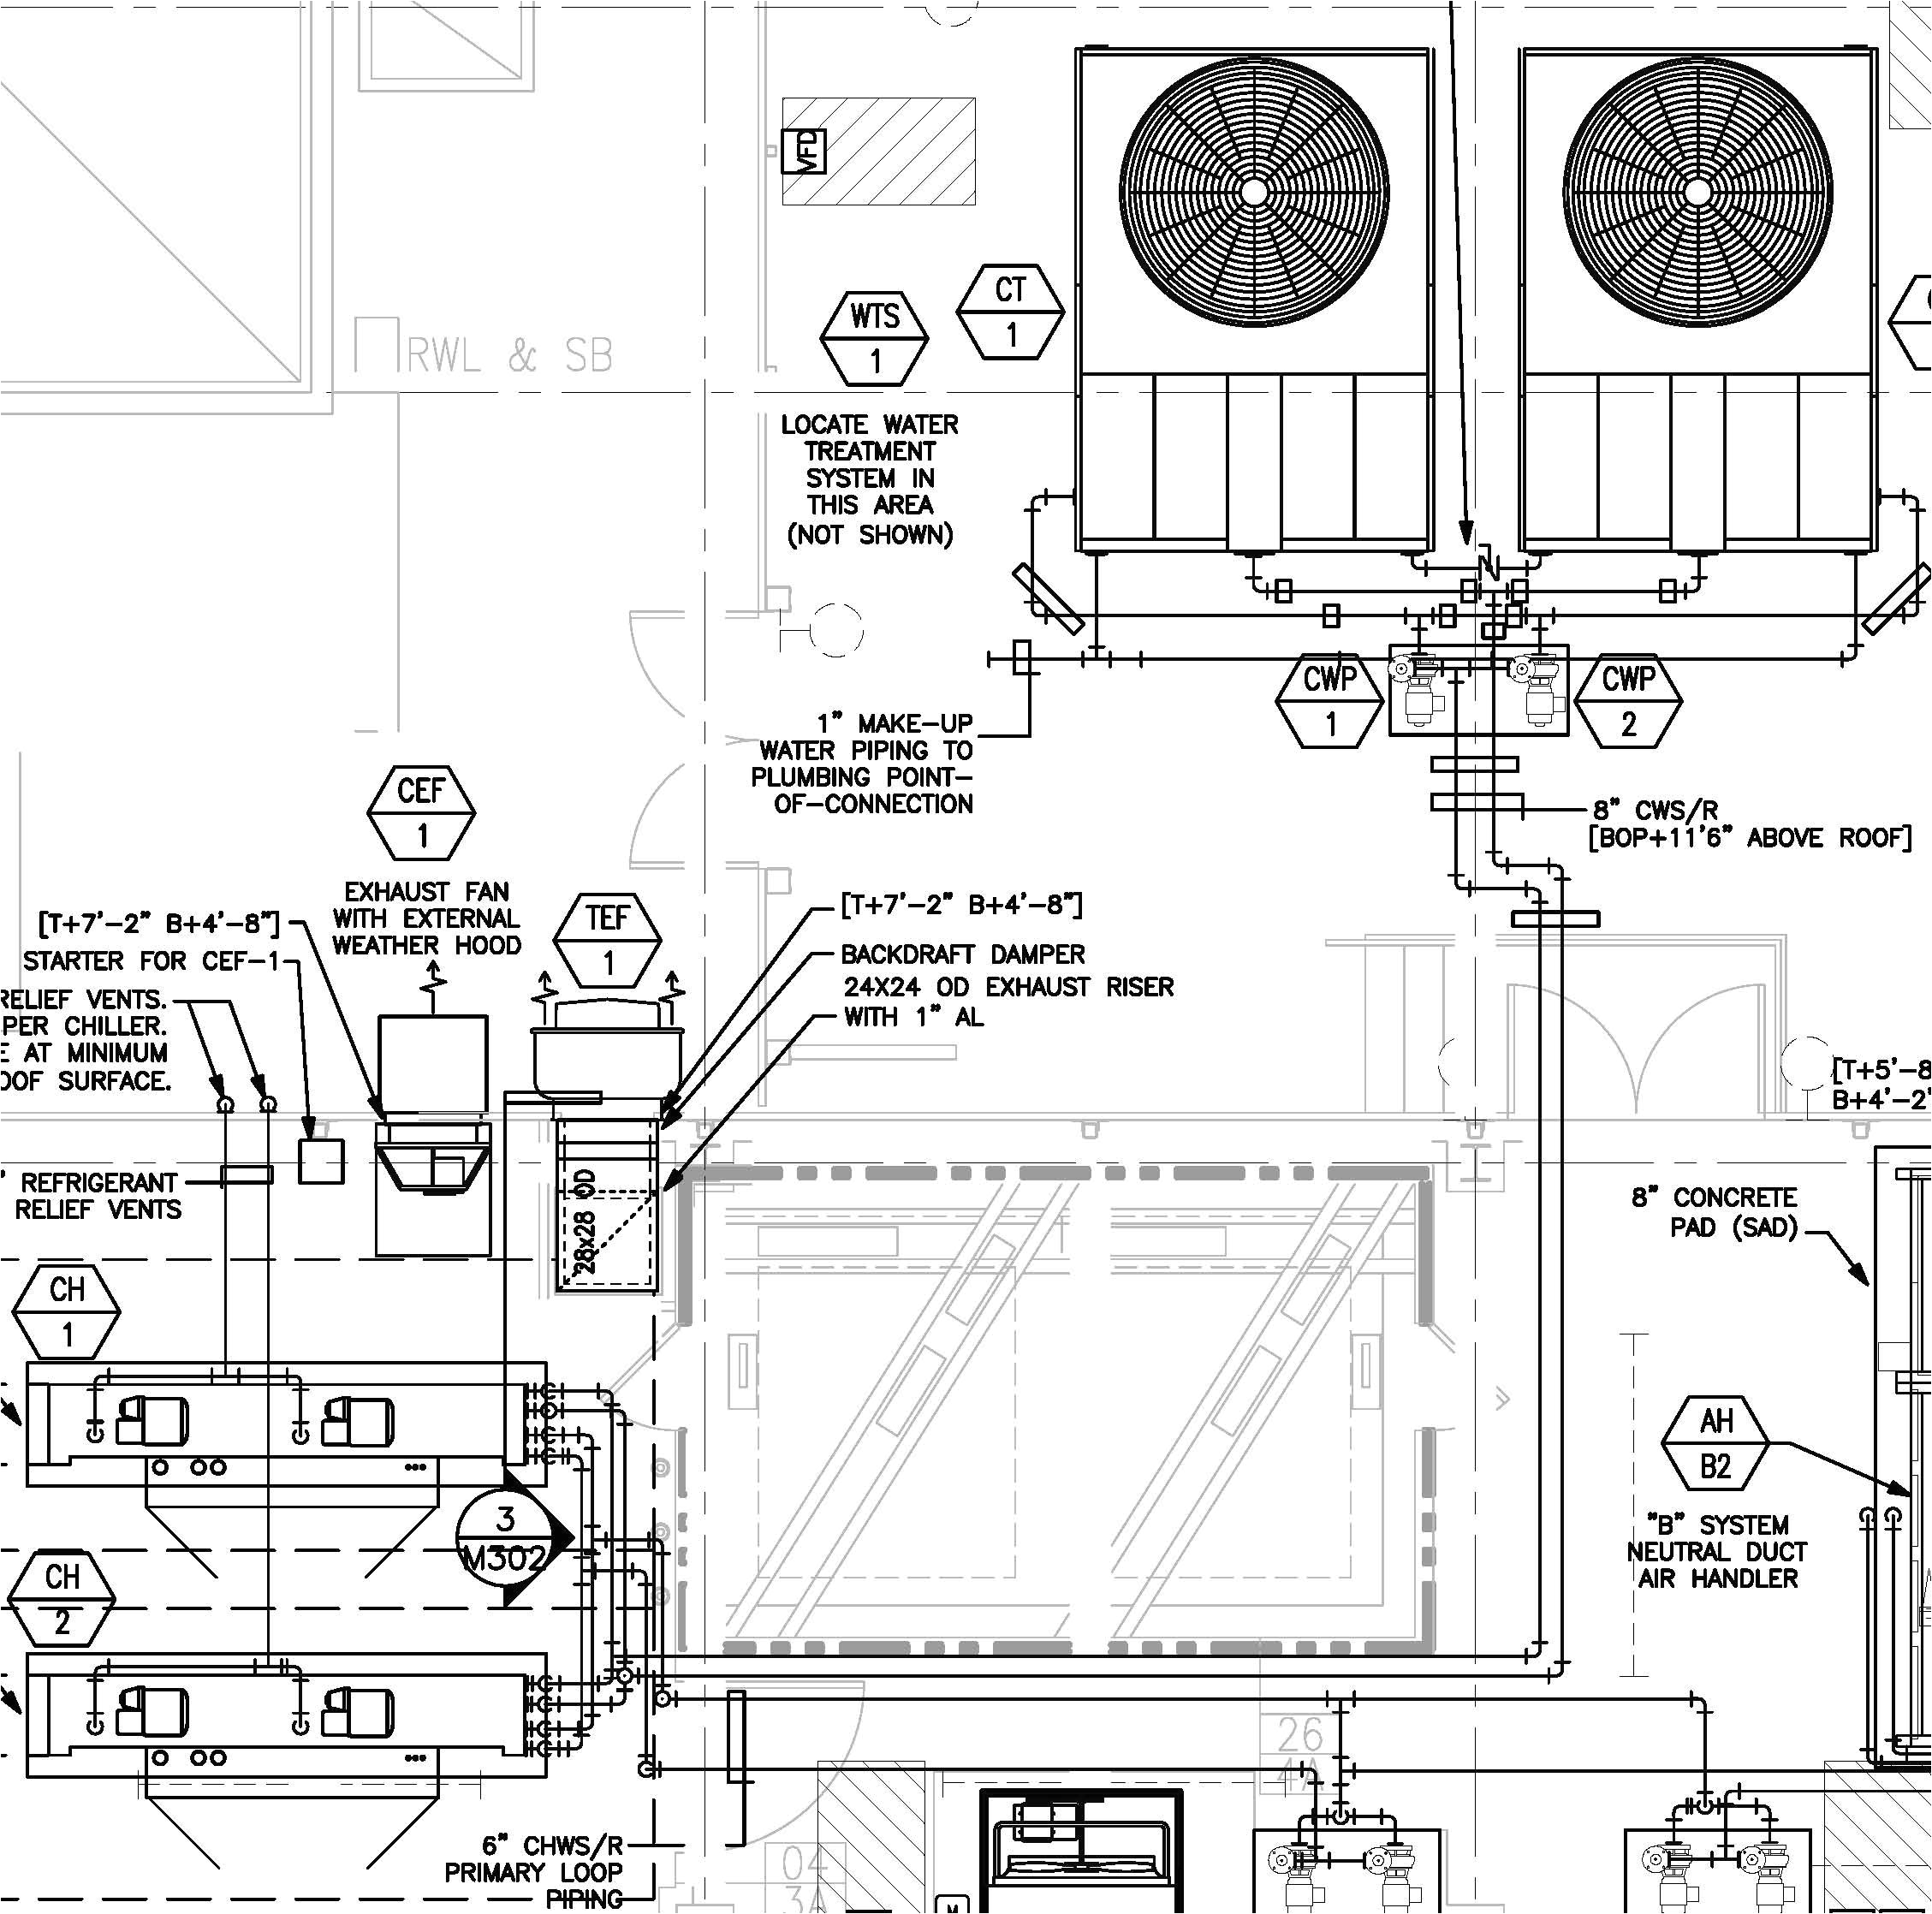 york condensing unit wiring diagram hvac condenser wiring diagram new air conditioning condensing unit wiring diagram valid wiring diagram 9e jpg